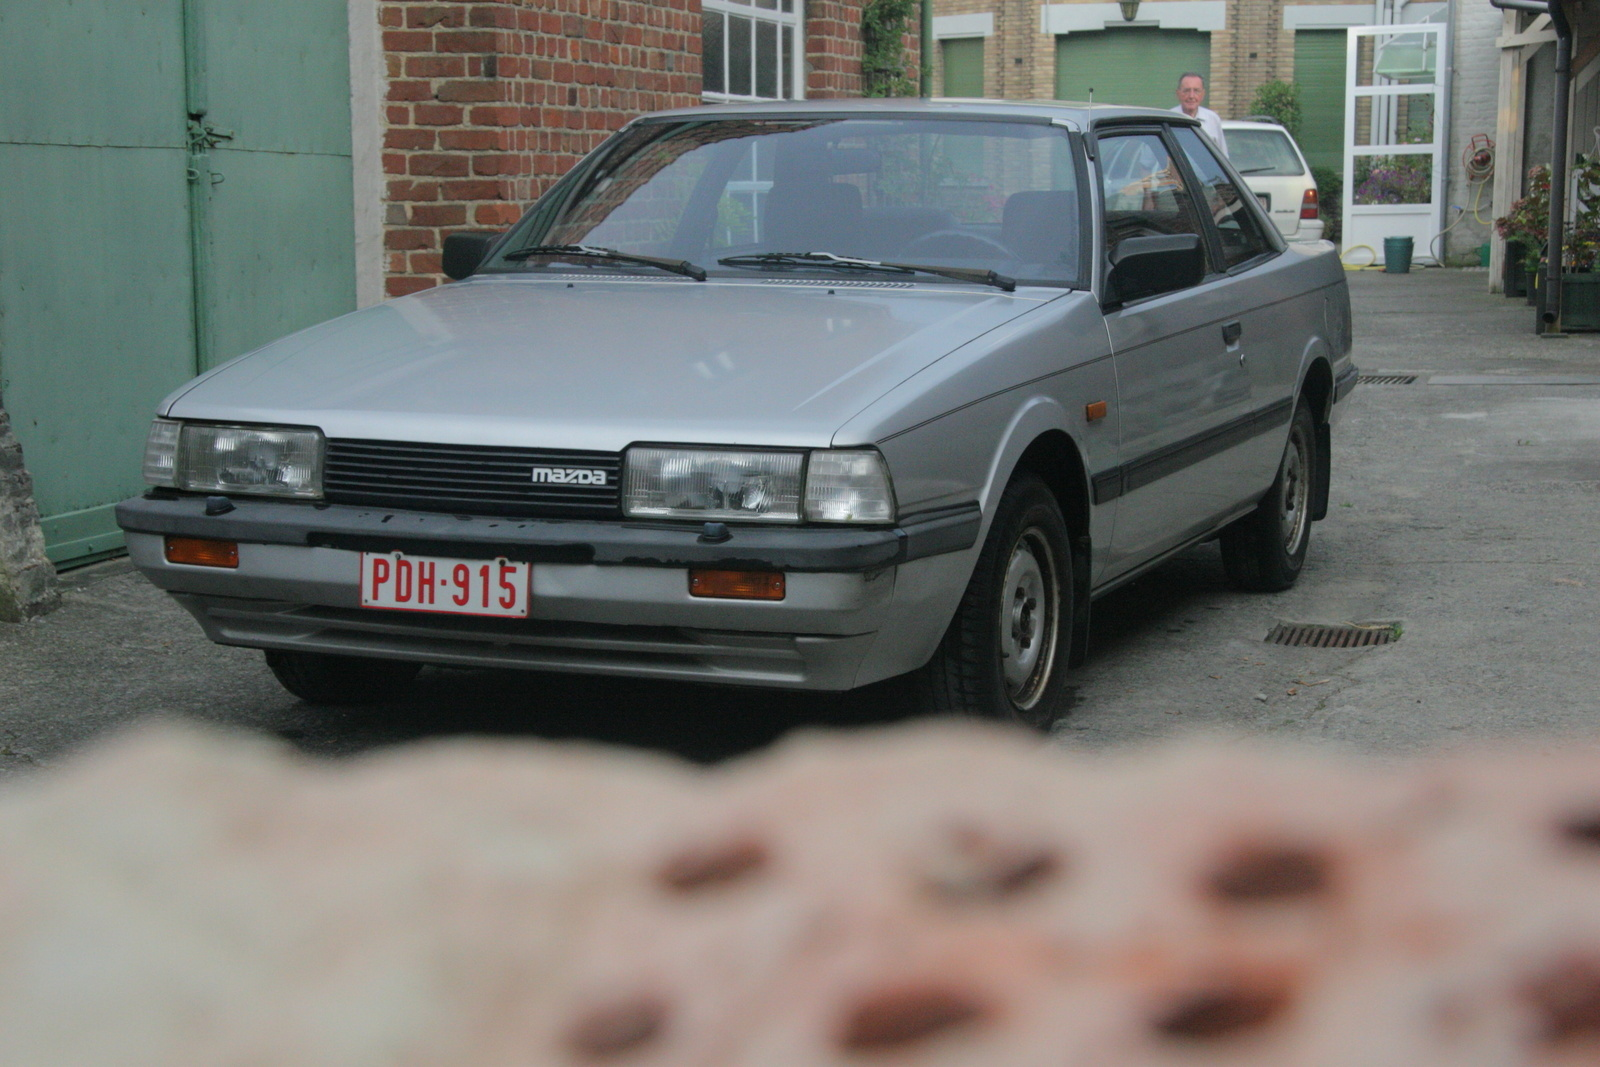 1985 Mazda 626 - Overview - CarGurus